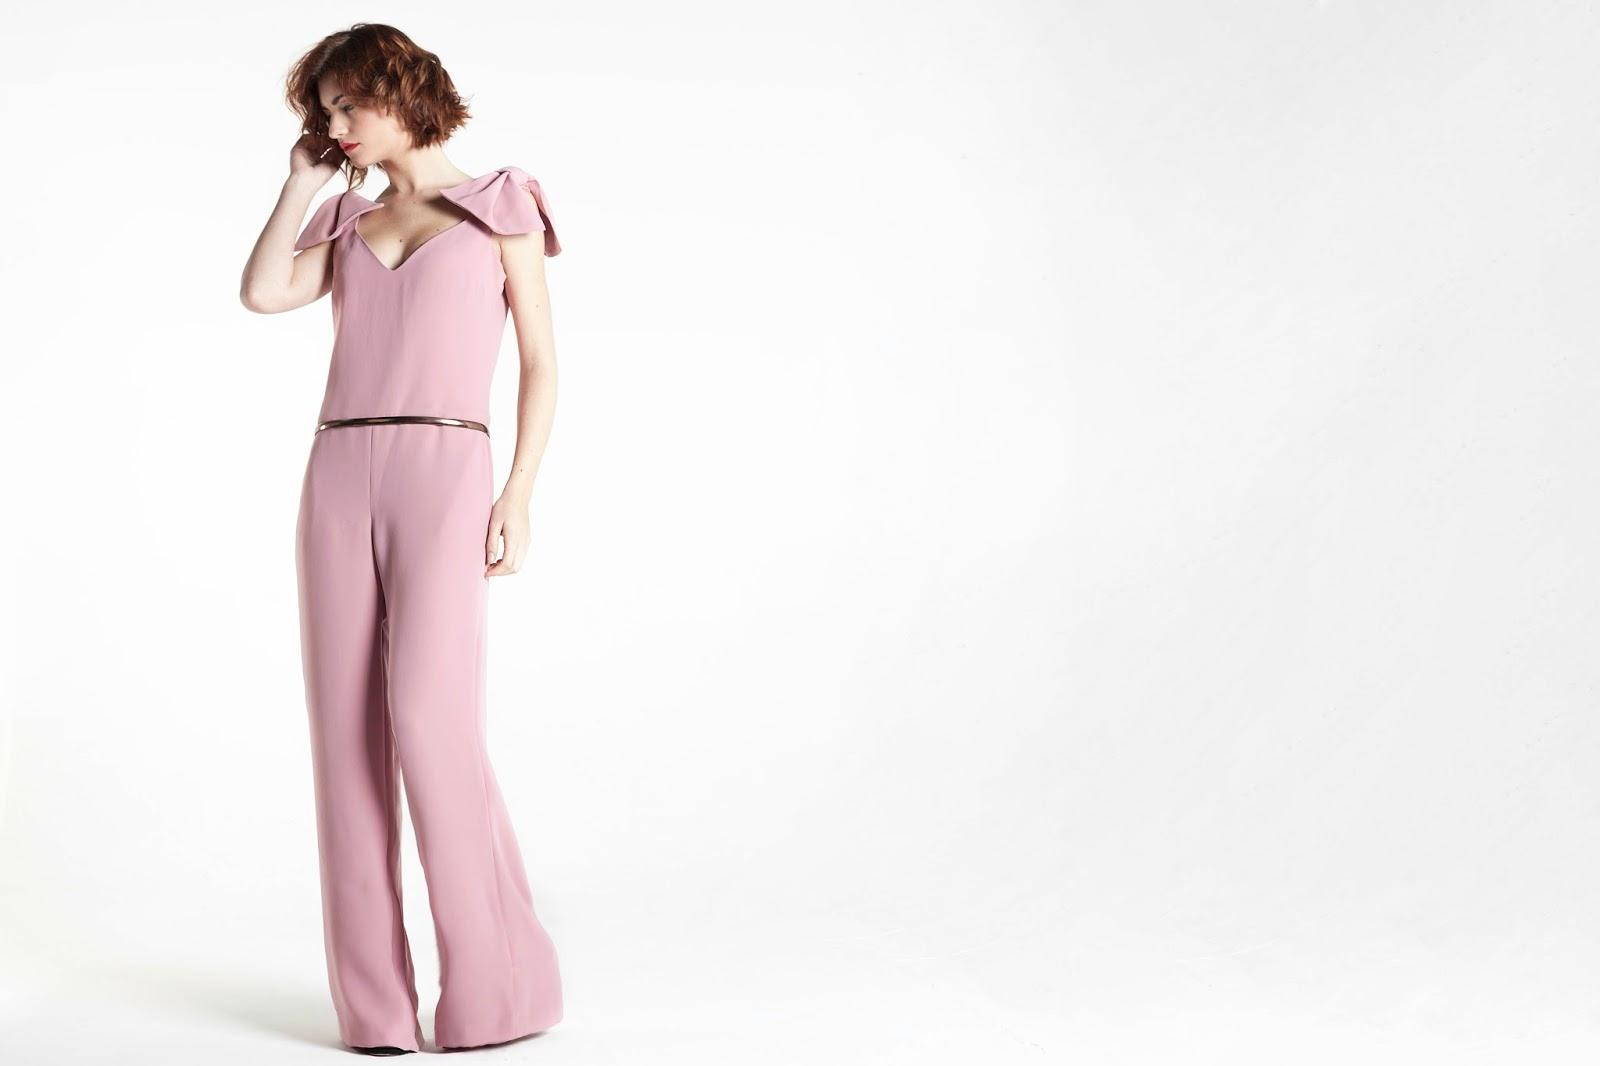 Mono rosa palo con detalle de lazos en hombro y pantalón recto - Blancaspina